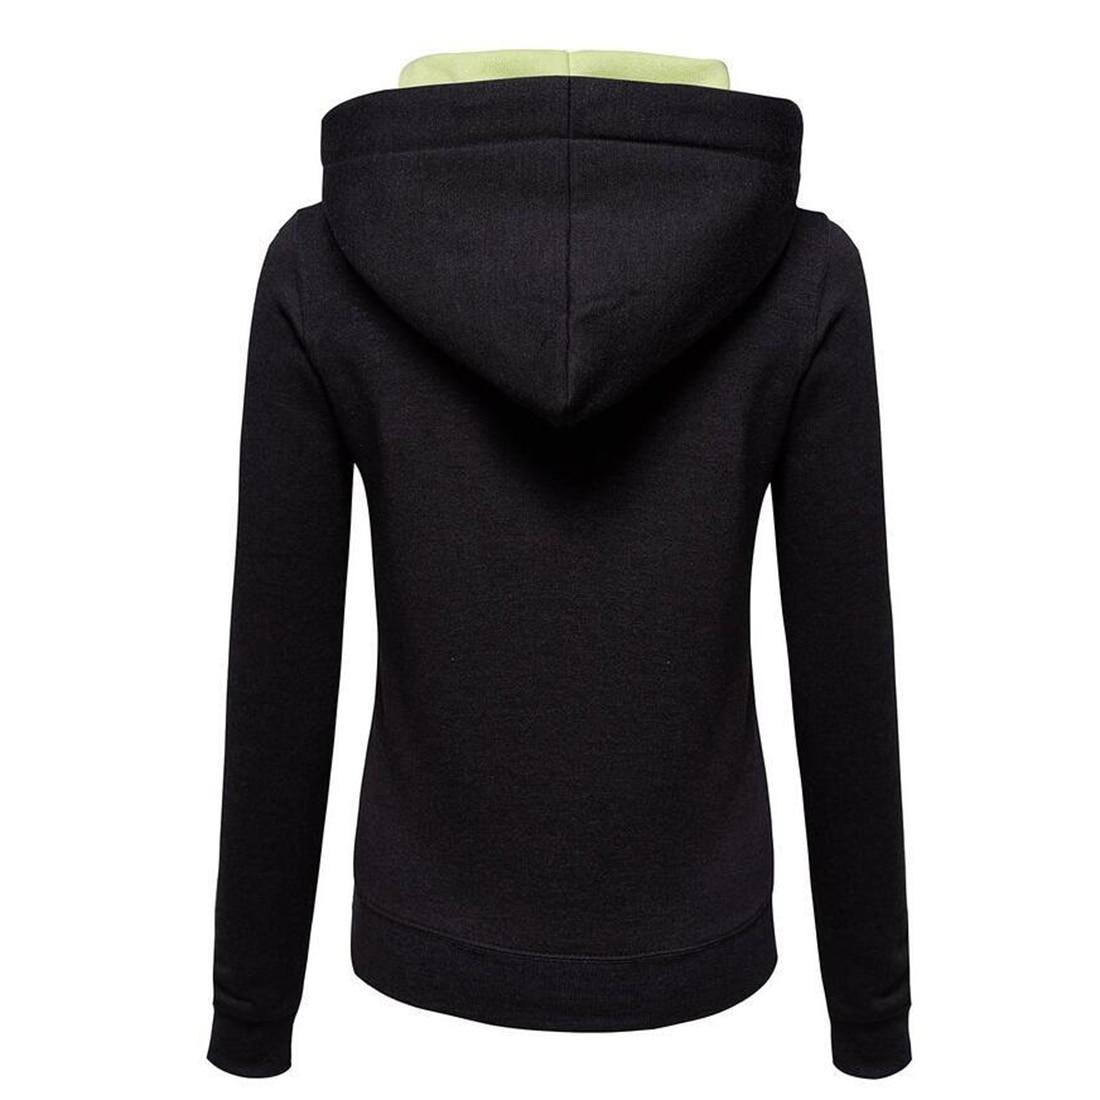 2017 Fashion Hoodies Dames Sweatshirt Casual lange mouw Hooded Hoodie - Dameskleding - Foto 6